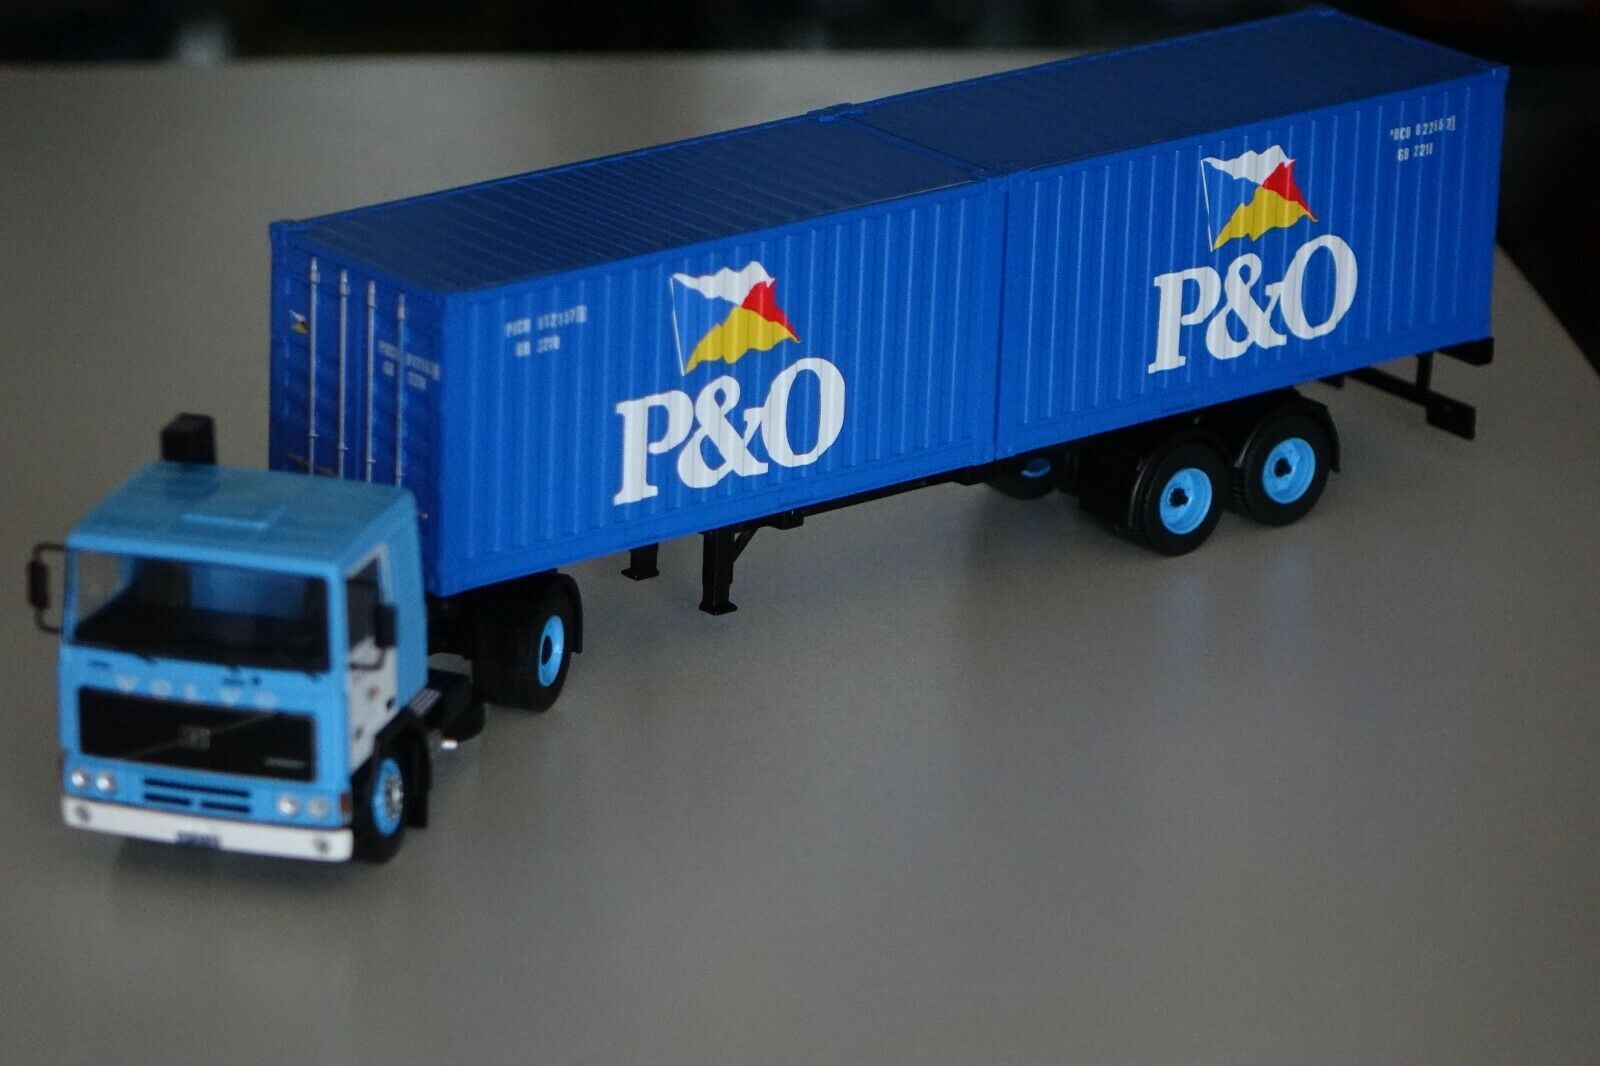 Volvo f10 p&o containersattelzug 1983 azul 1 43 Ixo ttr006 nuevo & OVP